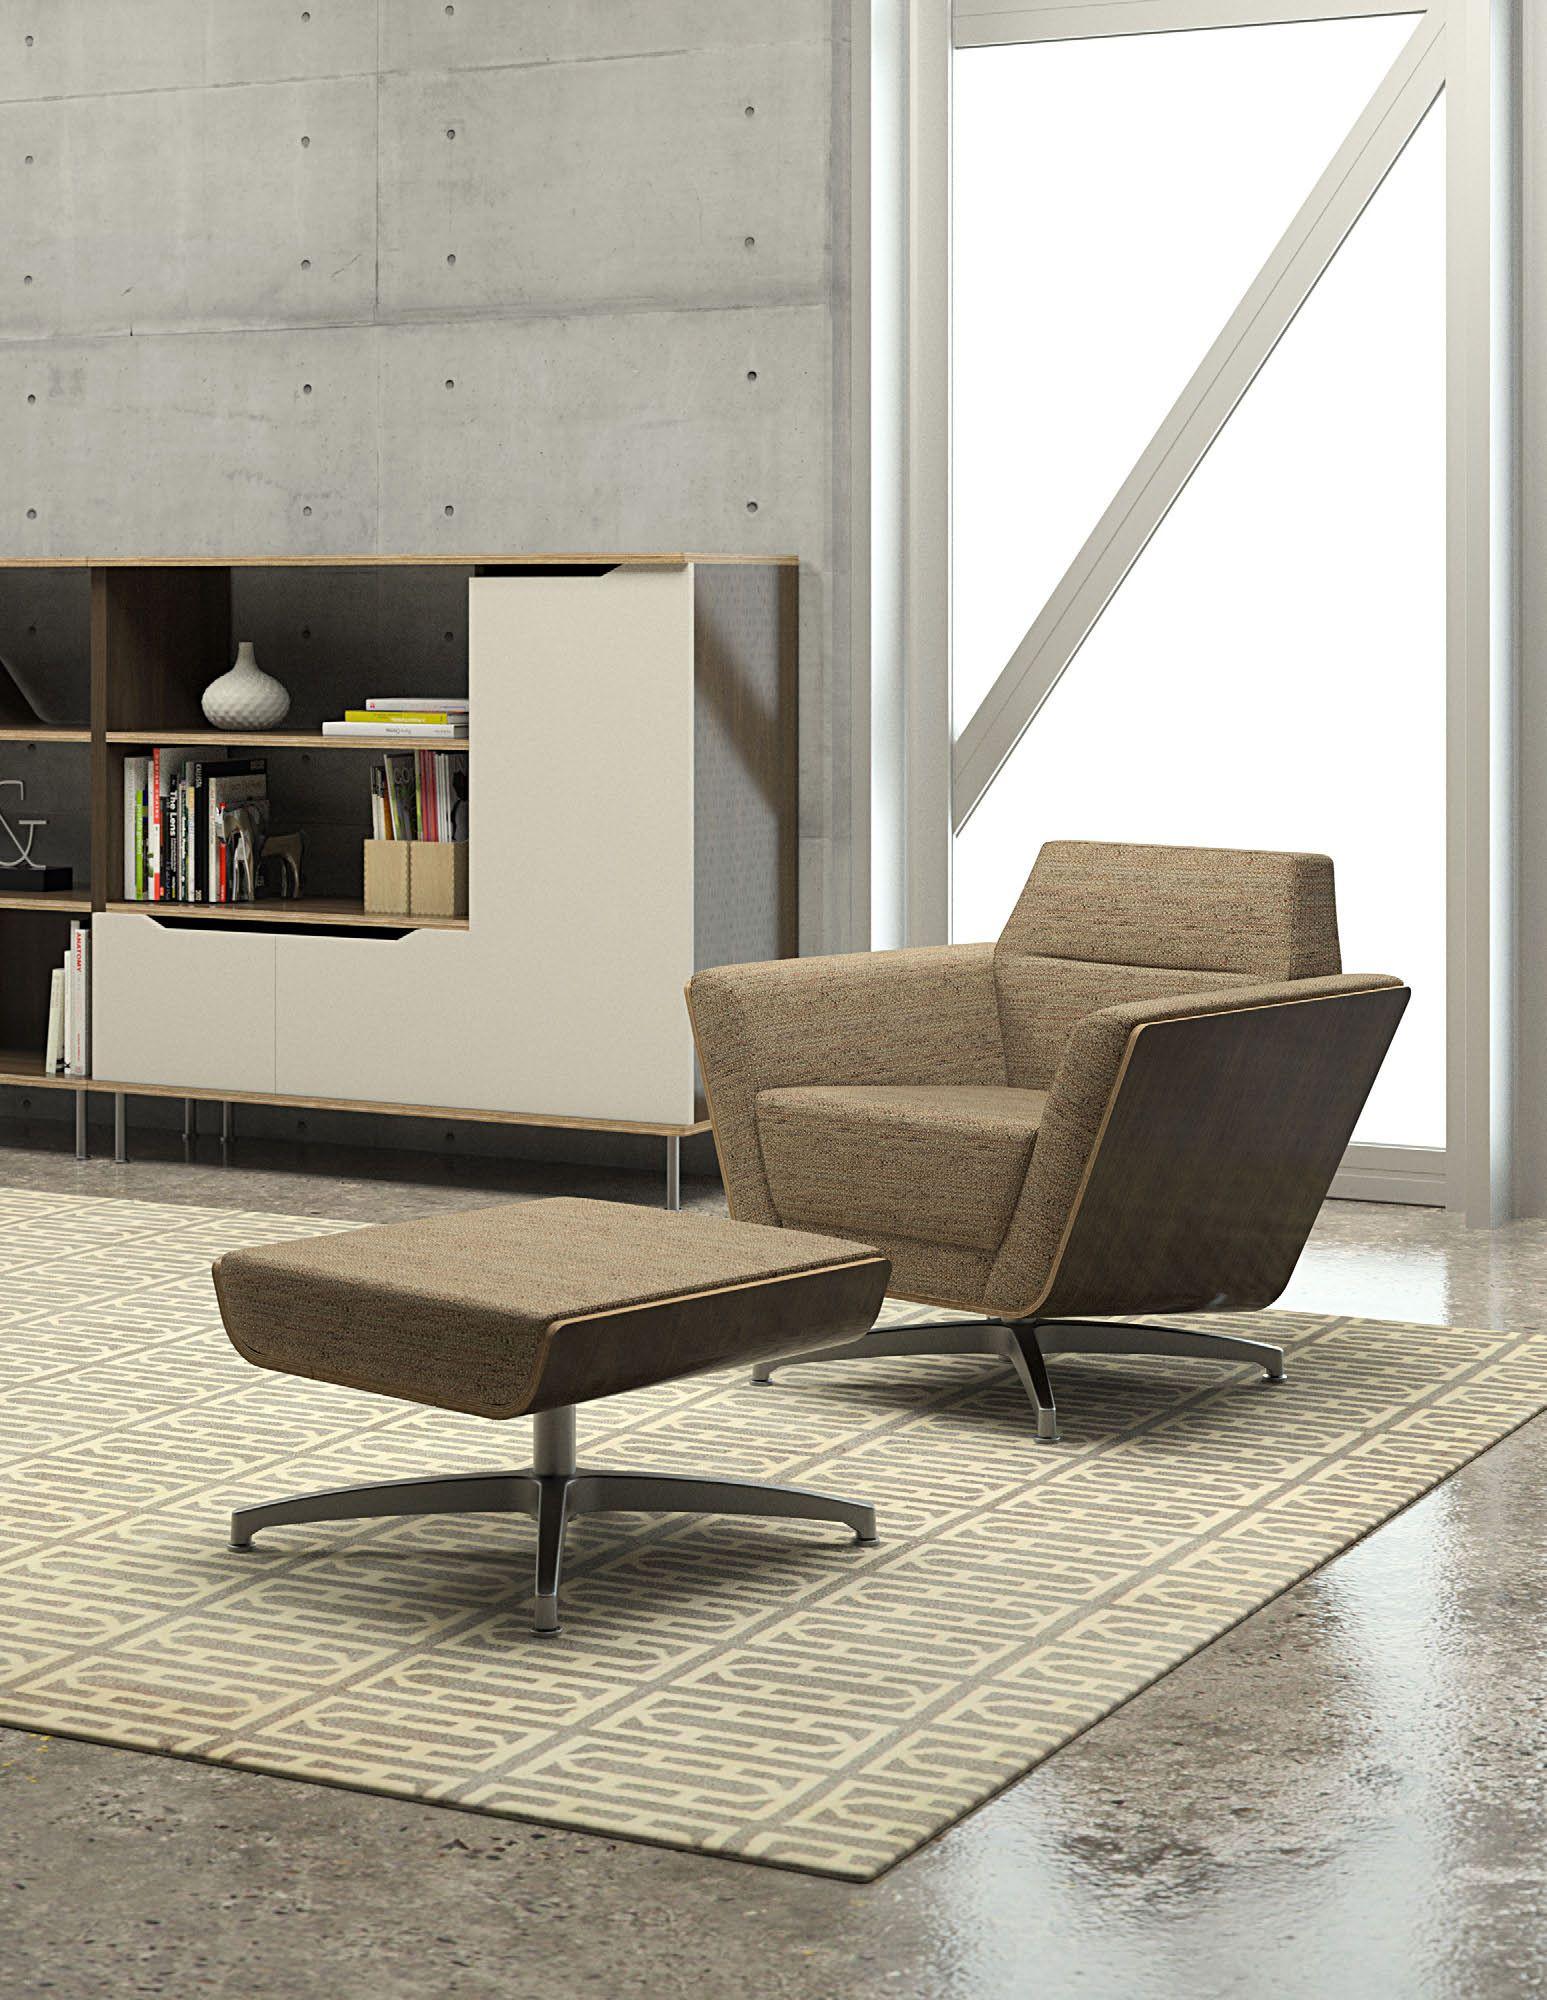 group contemporary office. Group Contemporary Office. Office O